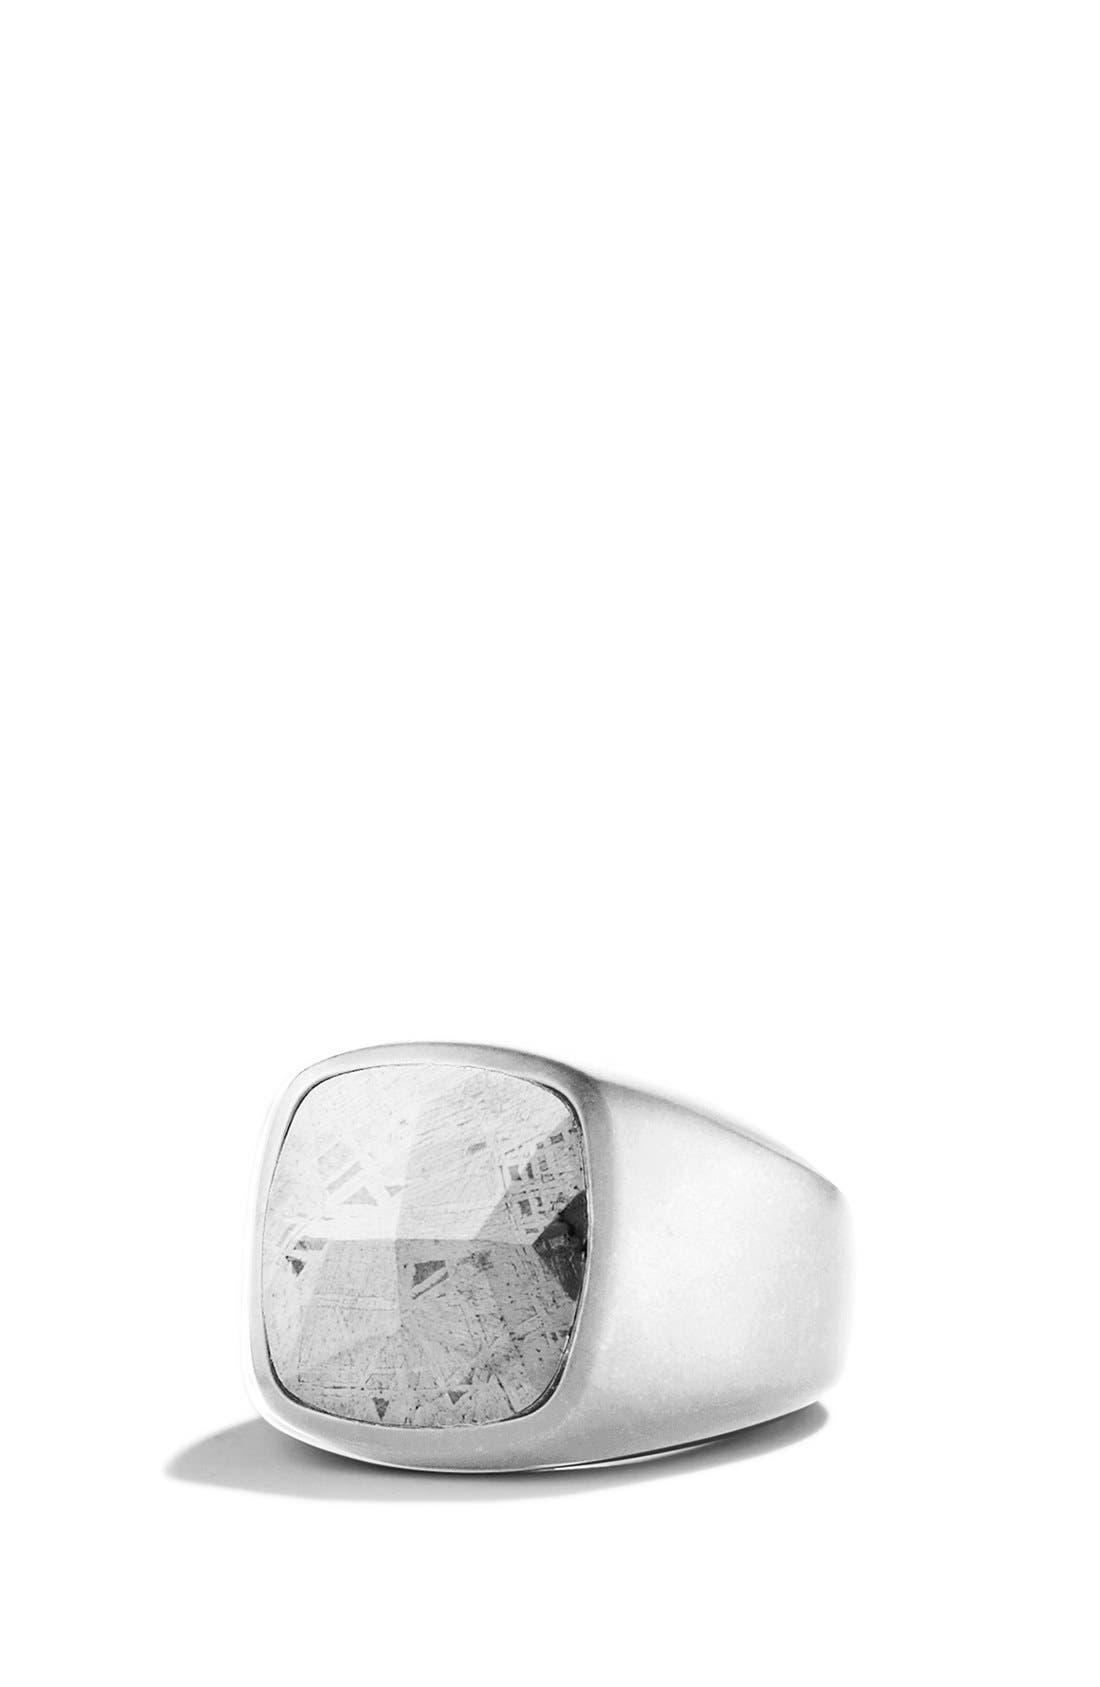 Signet Ring with Meteorite,                             Main thumbnail 1, color,                             Meteorite